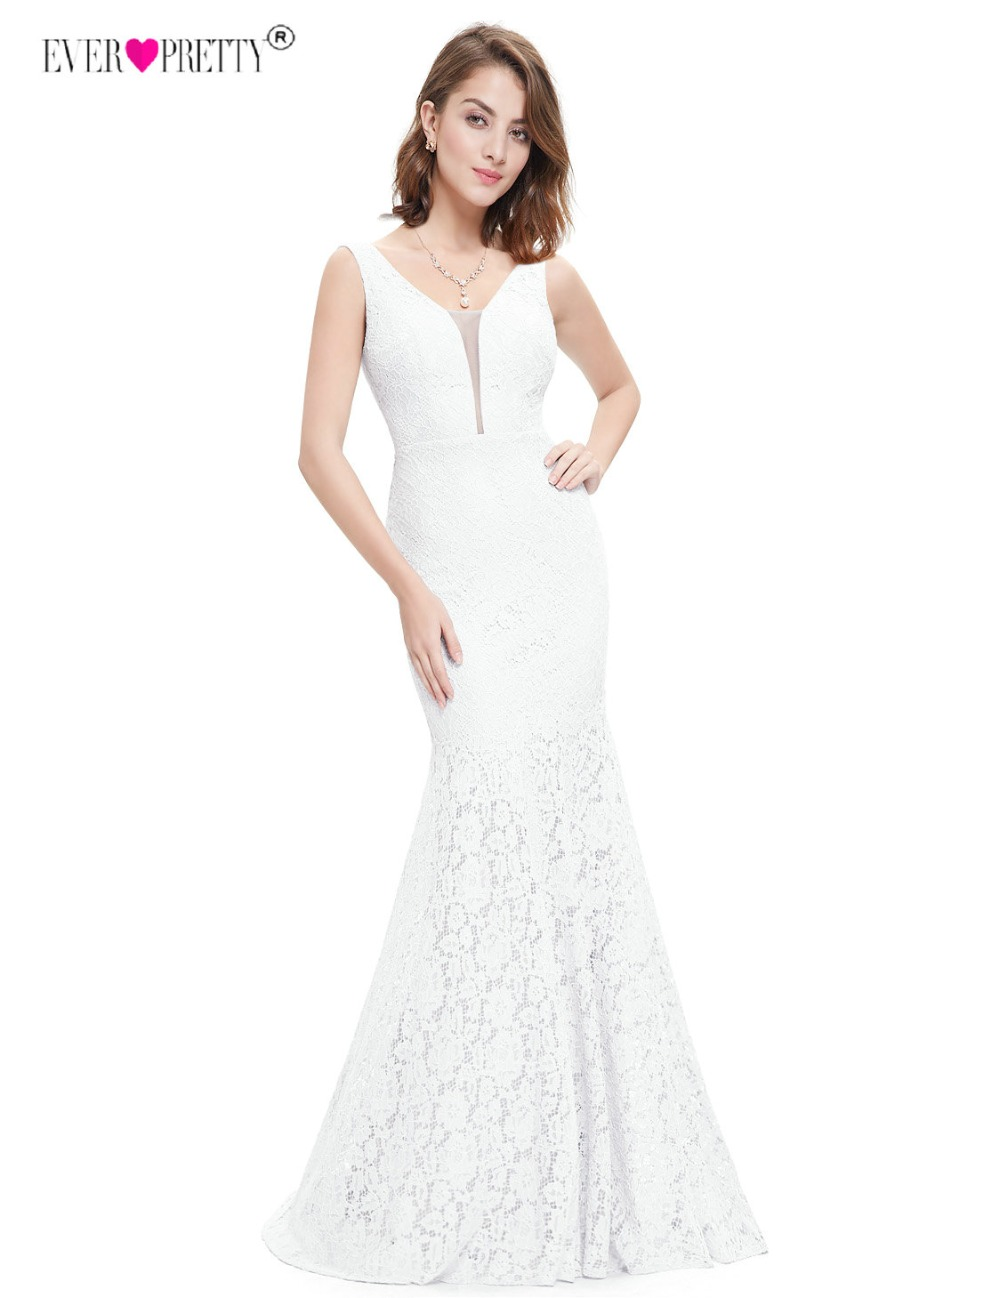 Ever Pretty Corset Lace Mermaid Wedding Dresses 2018 Simple Elegant Wedding Gowns for Bride Dress Boda robe de mariee EP08838 1